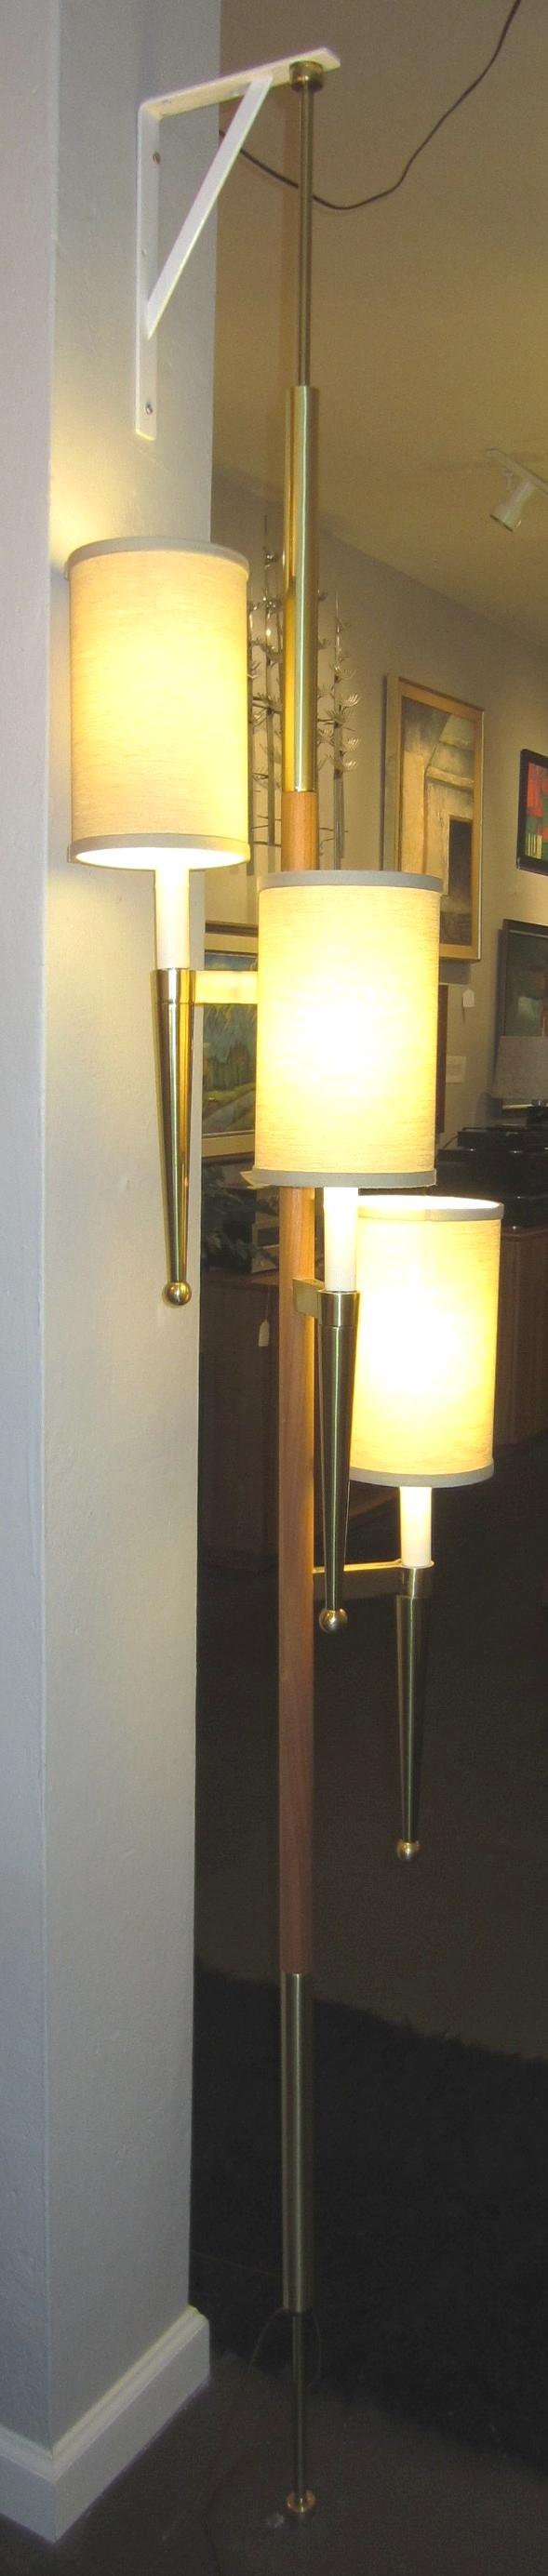 Perfect Highendtensionlamp.1950smodernthreelightpolelamp.loiselvintagemodern.2.JPG